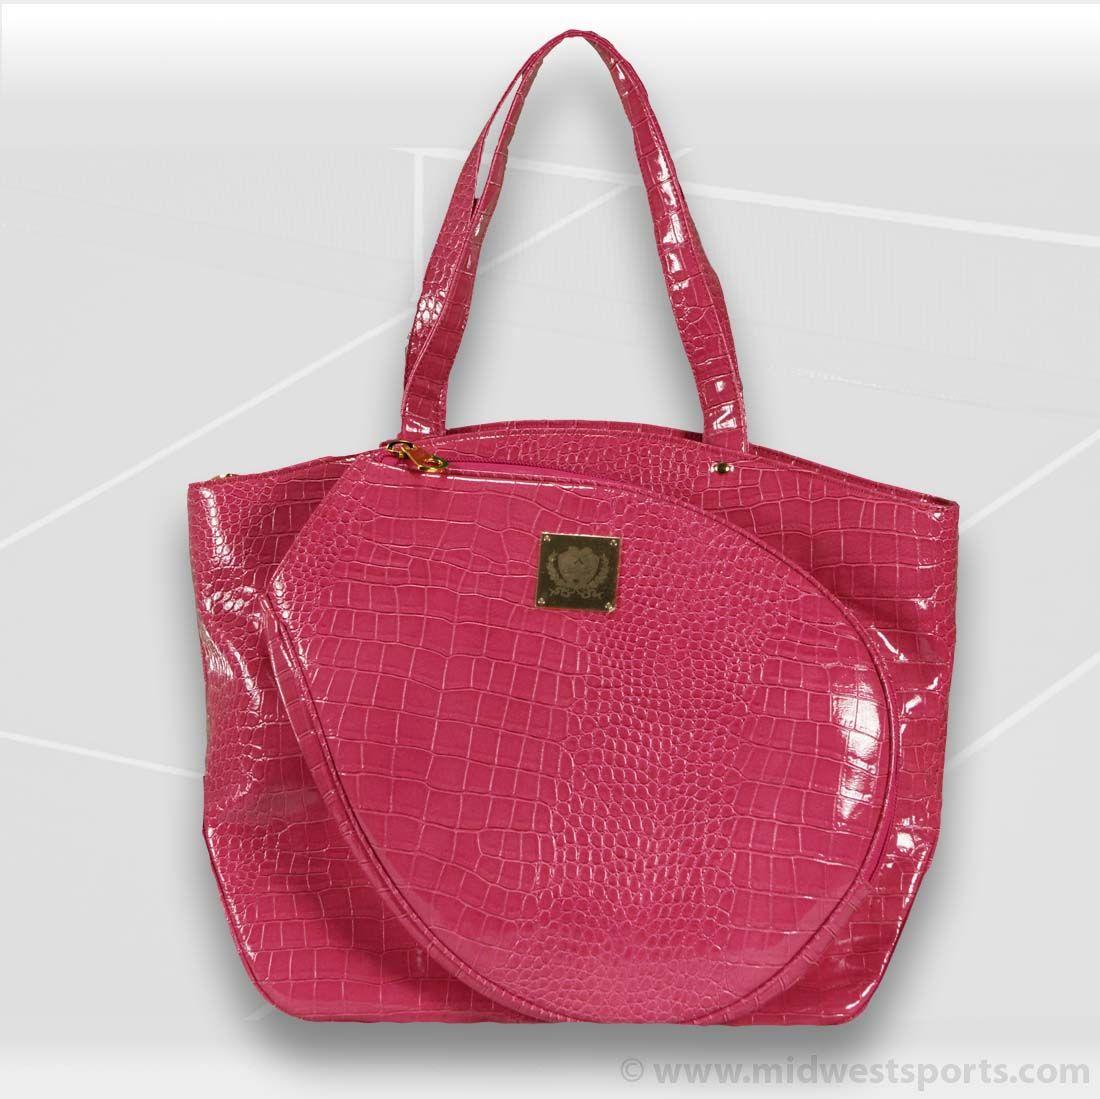 bd47c8352636 Pin by All Travel Bag on Travel Bags | Tennis bags, Tennis bag, Bags